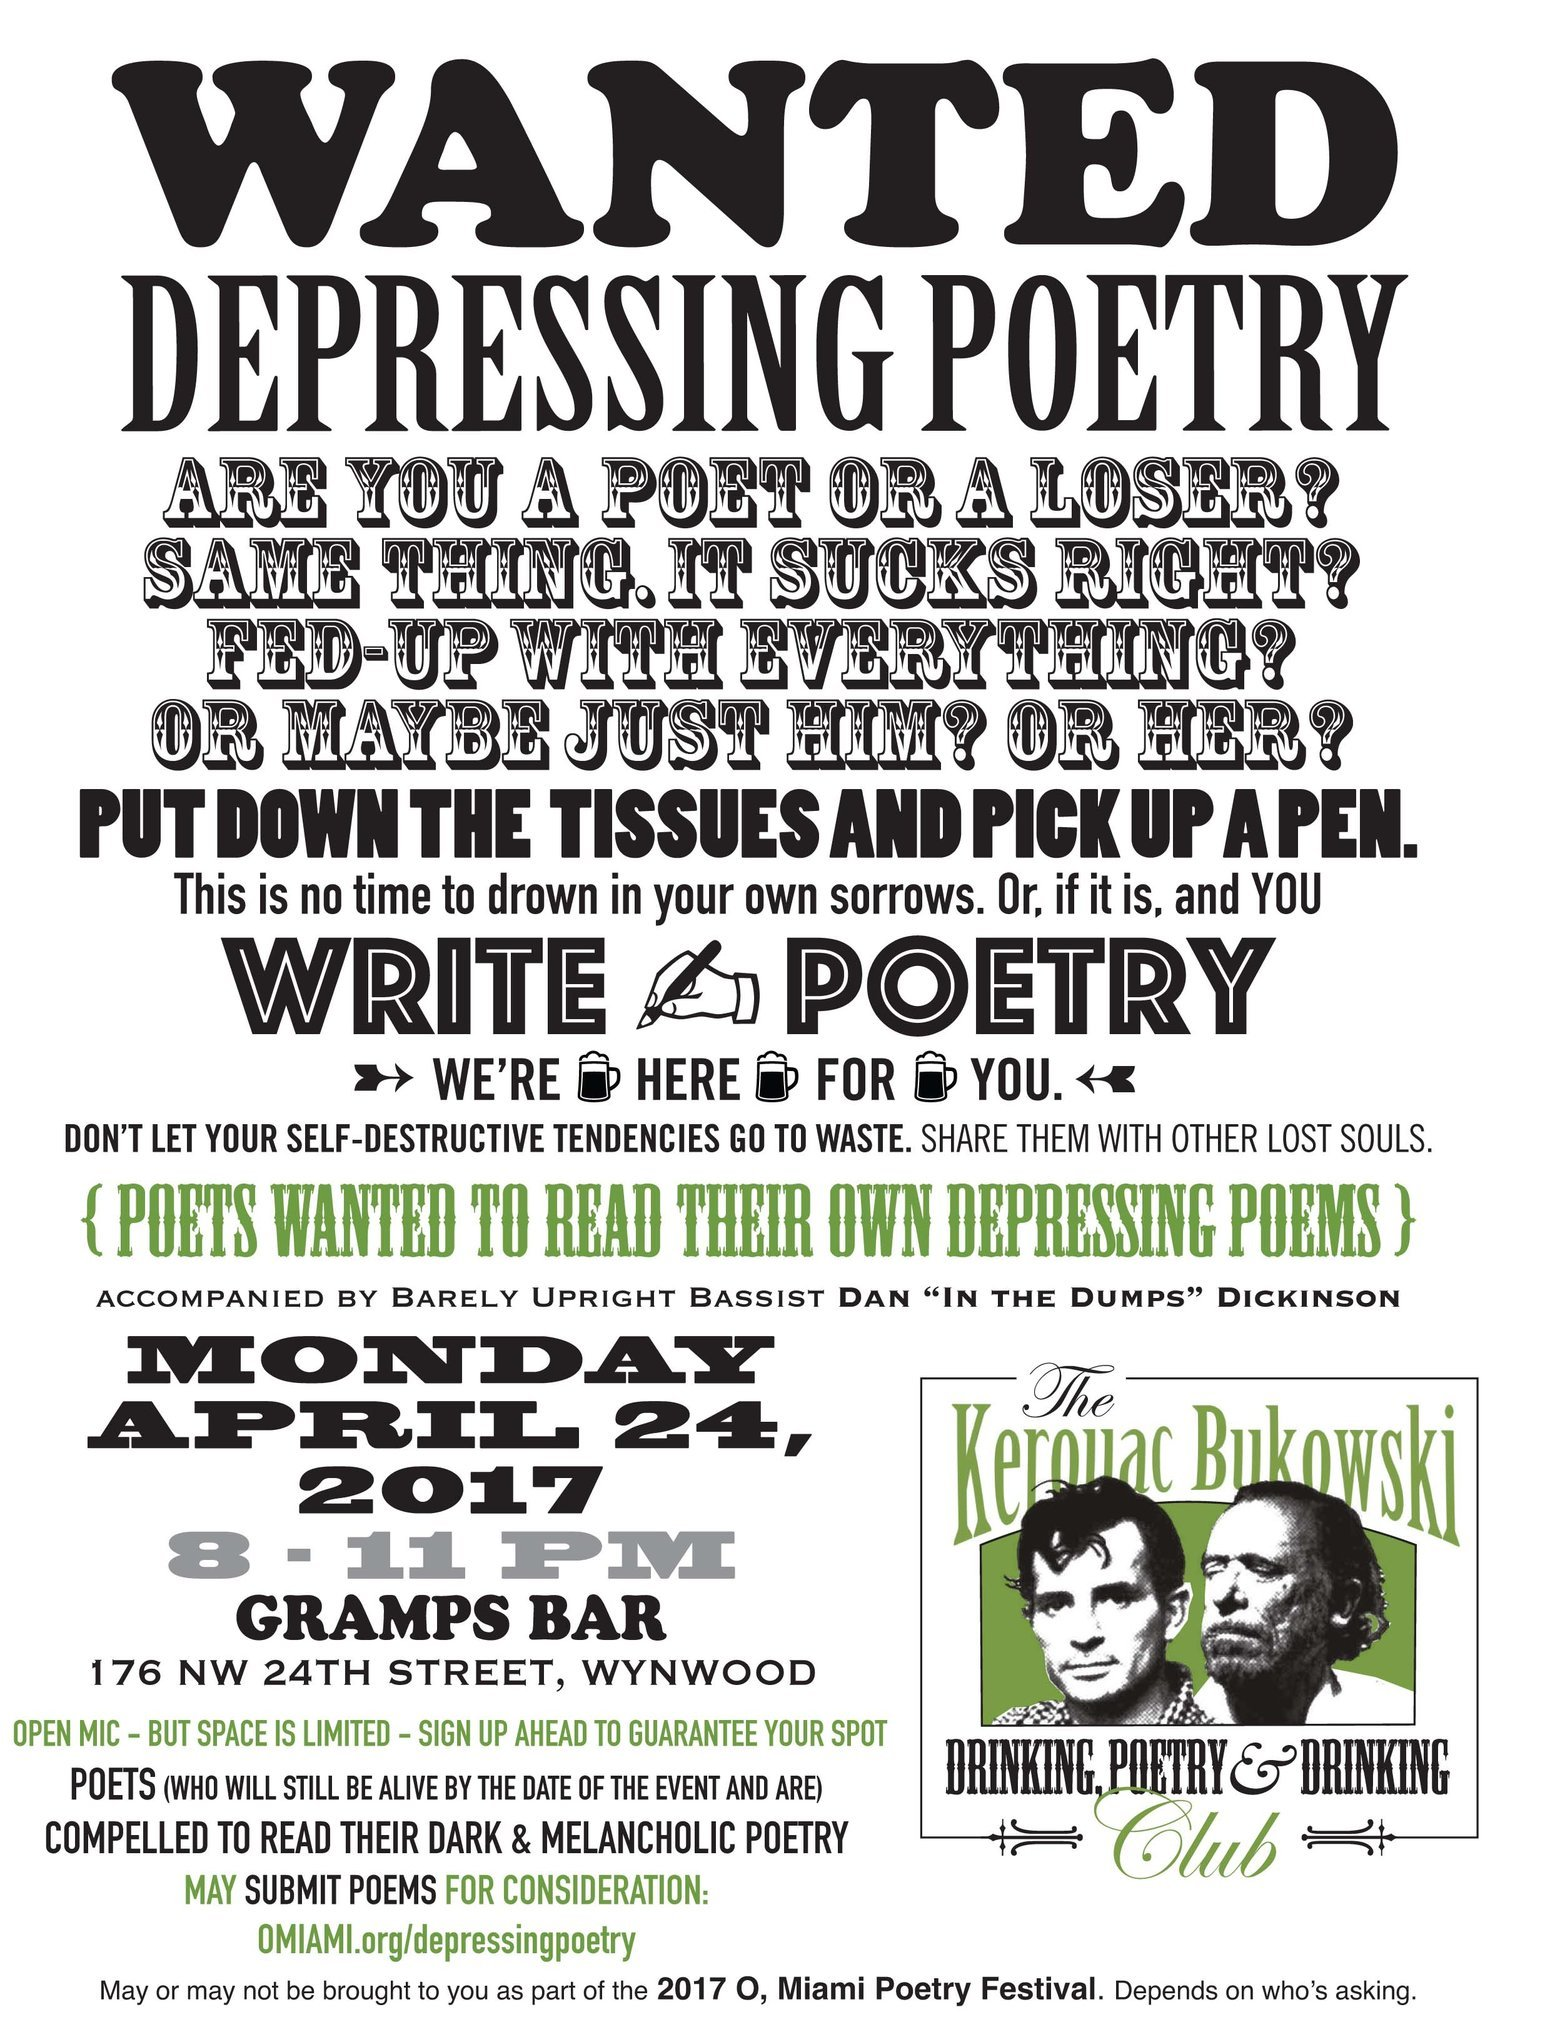 Kerouac Bukowski D P & D Club_H.jpg